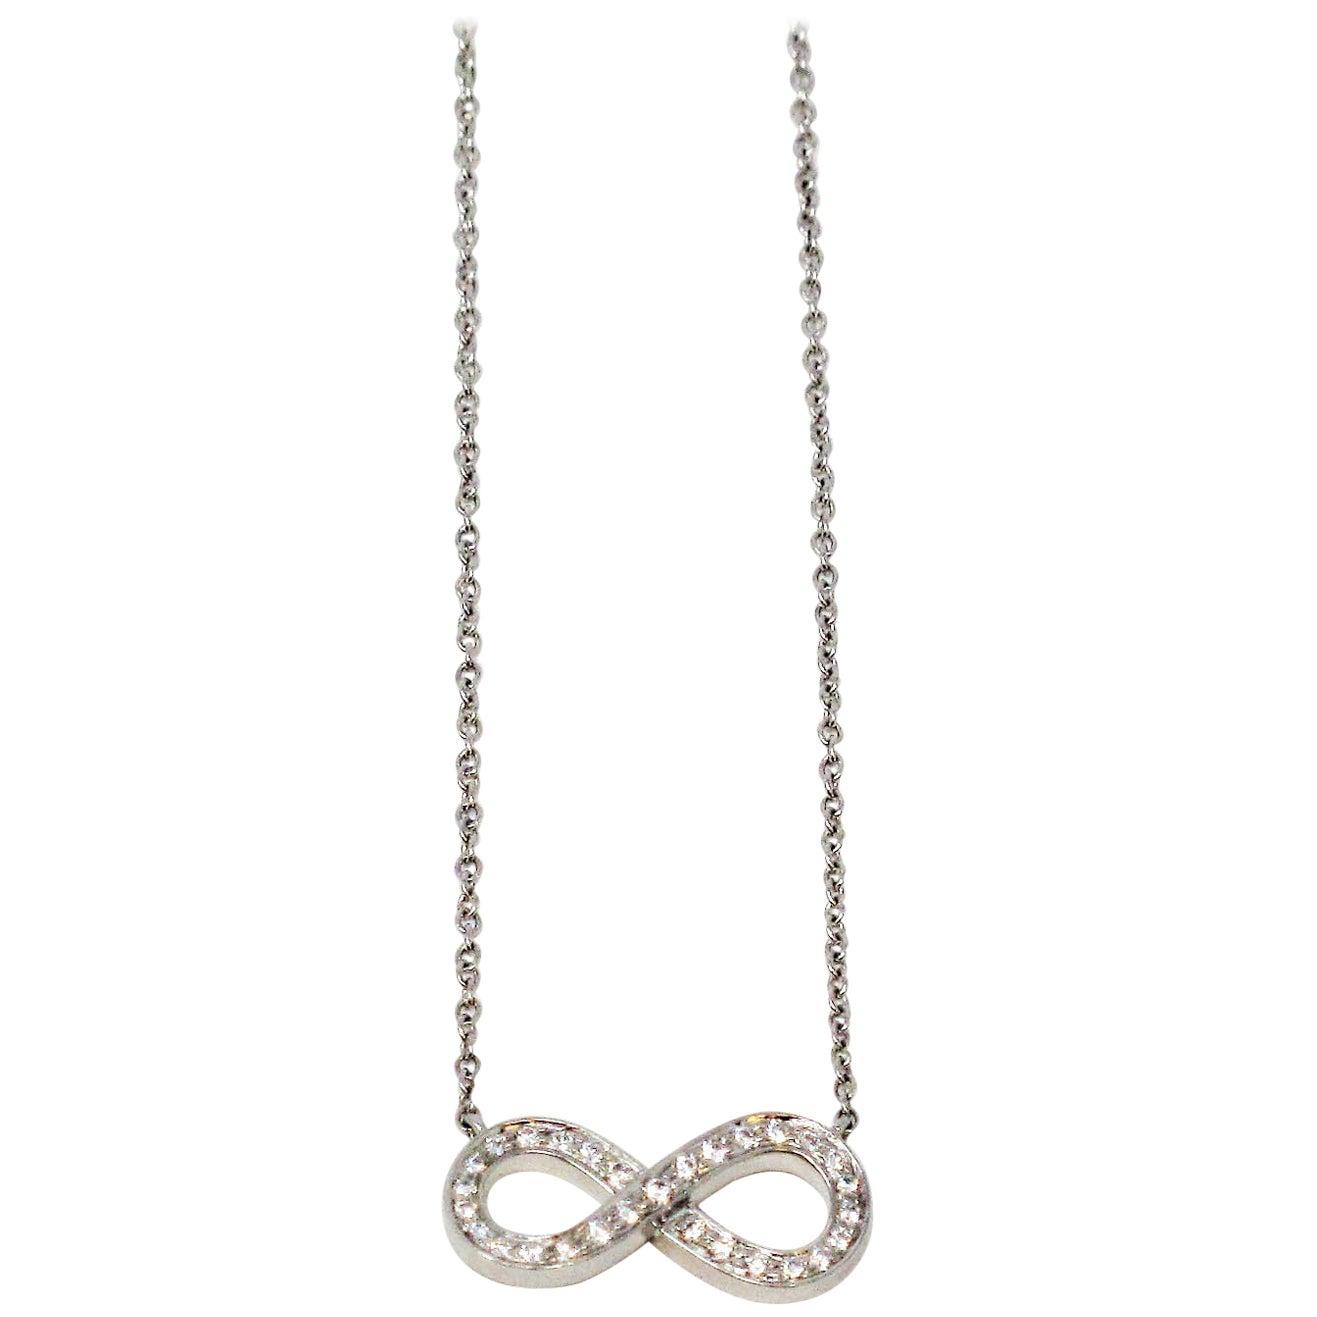 Tiffany & Co. Pave Diamond Infinity Pendant Necklace in Platinum